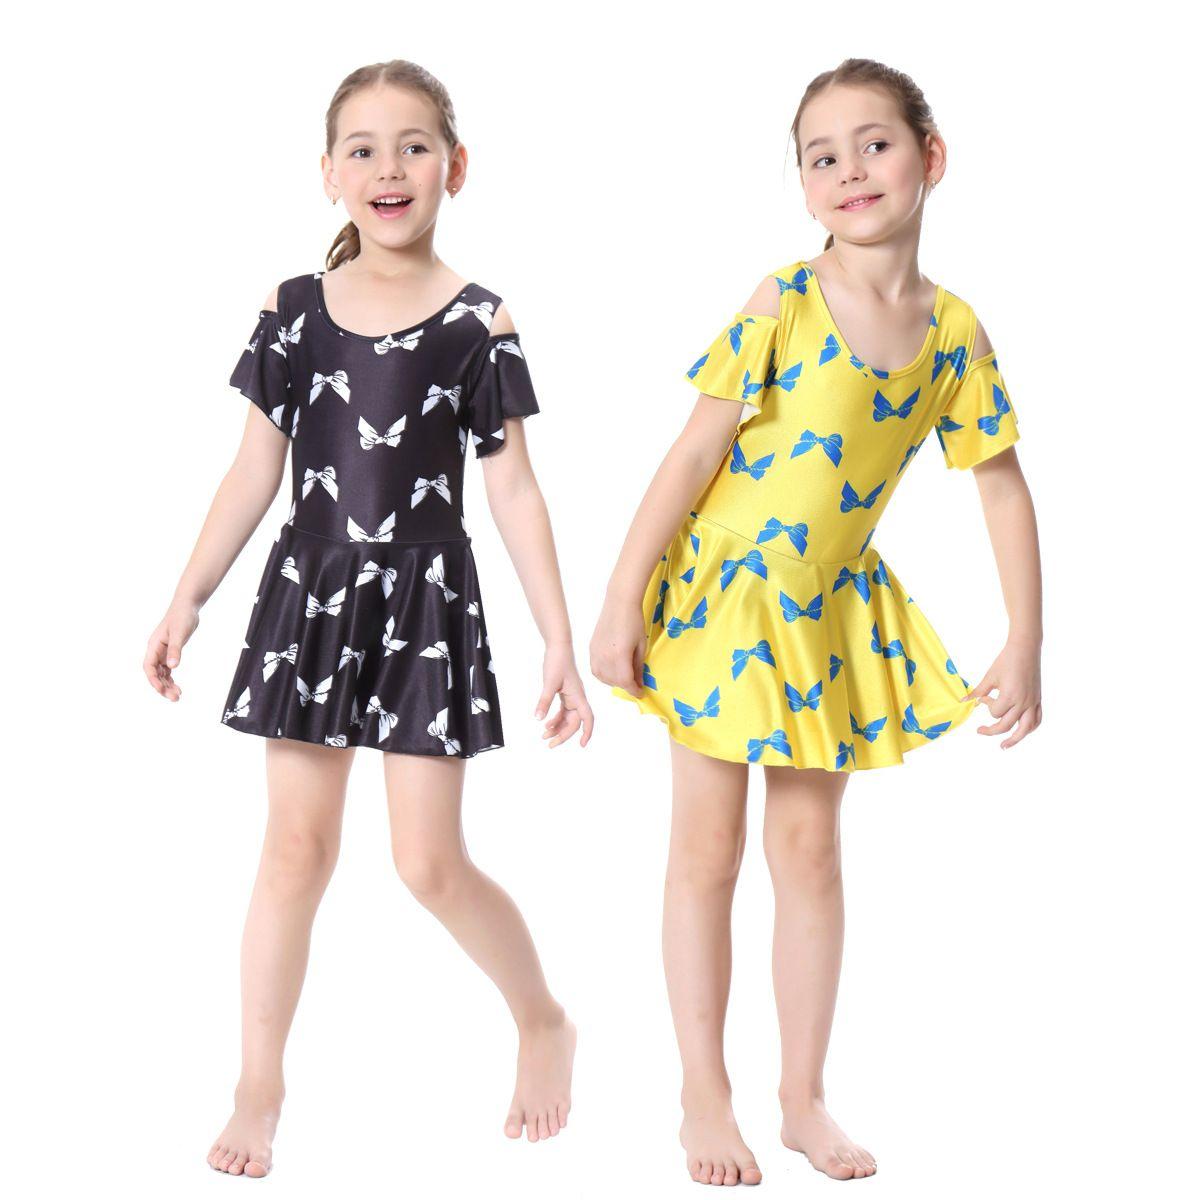 afb8eaee4c5f3 Girls Muslim Swimwear Islamic Children Short Sleeve Skirt Swimsuits Arab  Islam Beach Wear Swimdress Suits Burkinis Swim Pant